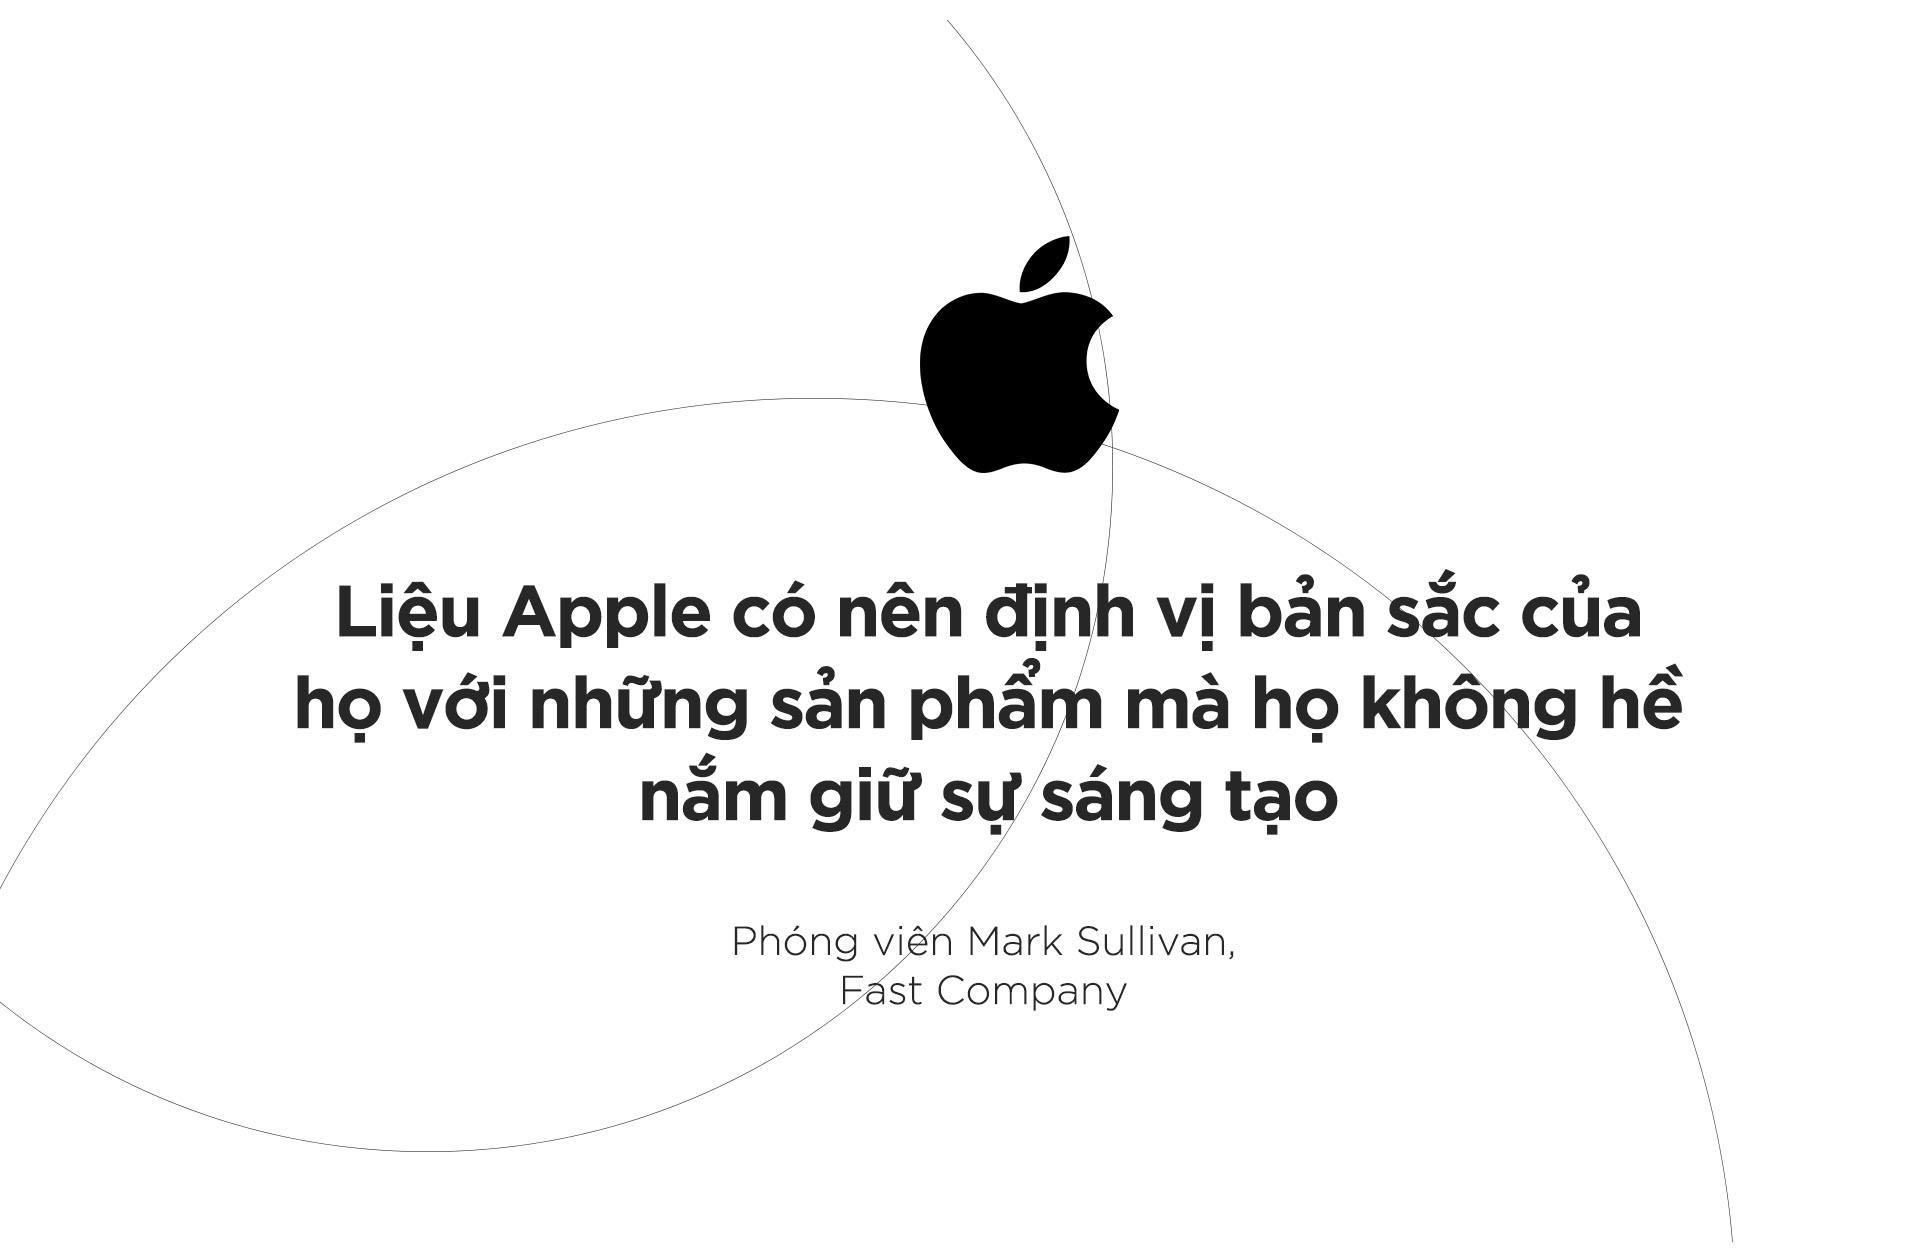 Tim Cook va hanh trinh tim loi di cho Apple thoi 'hau iPhone' hinh anh 17